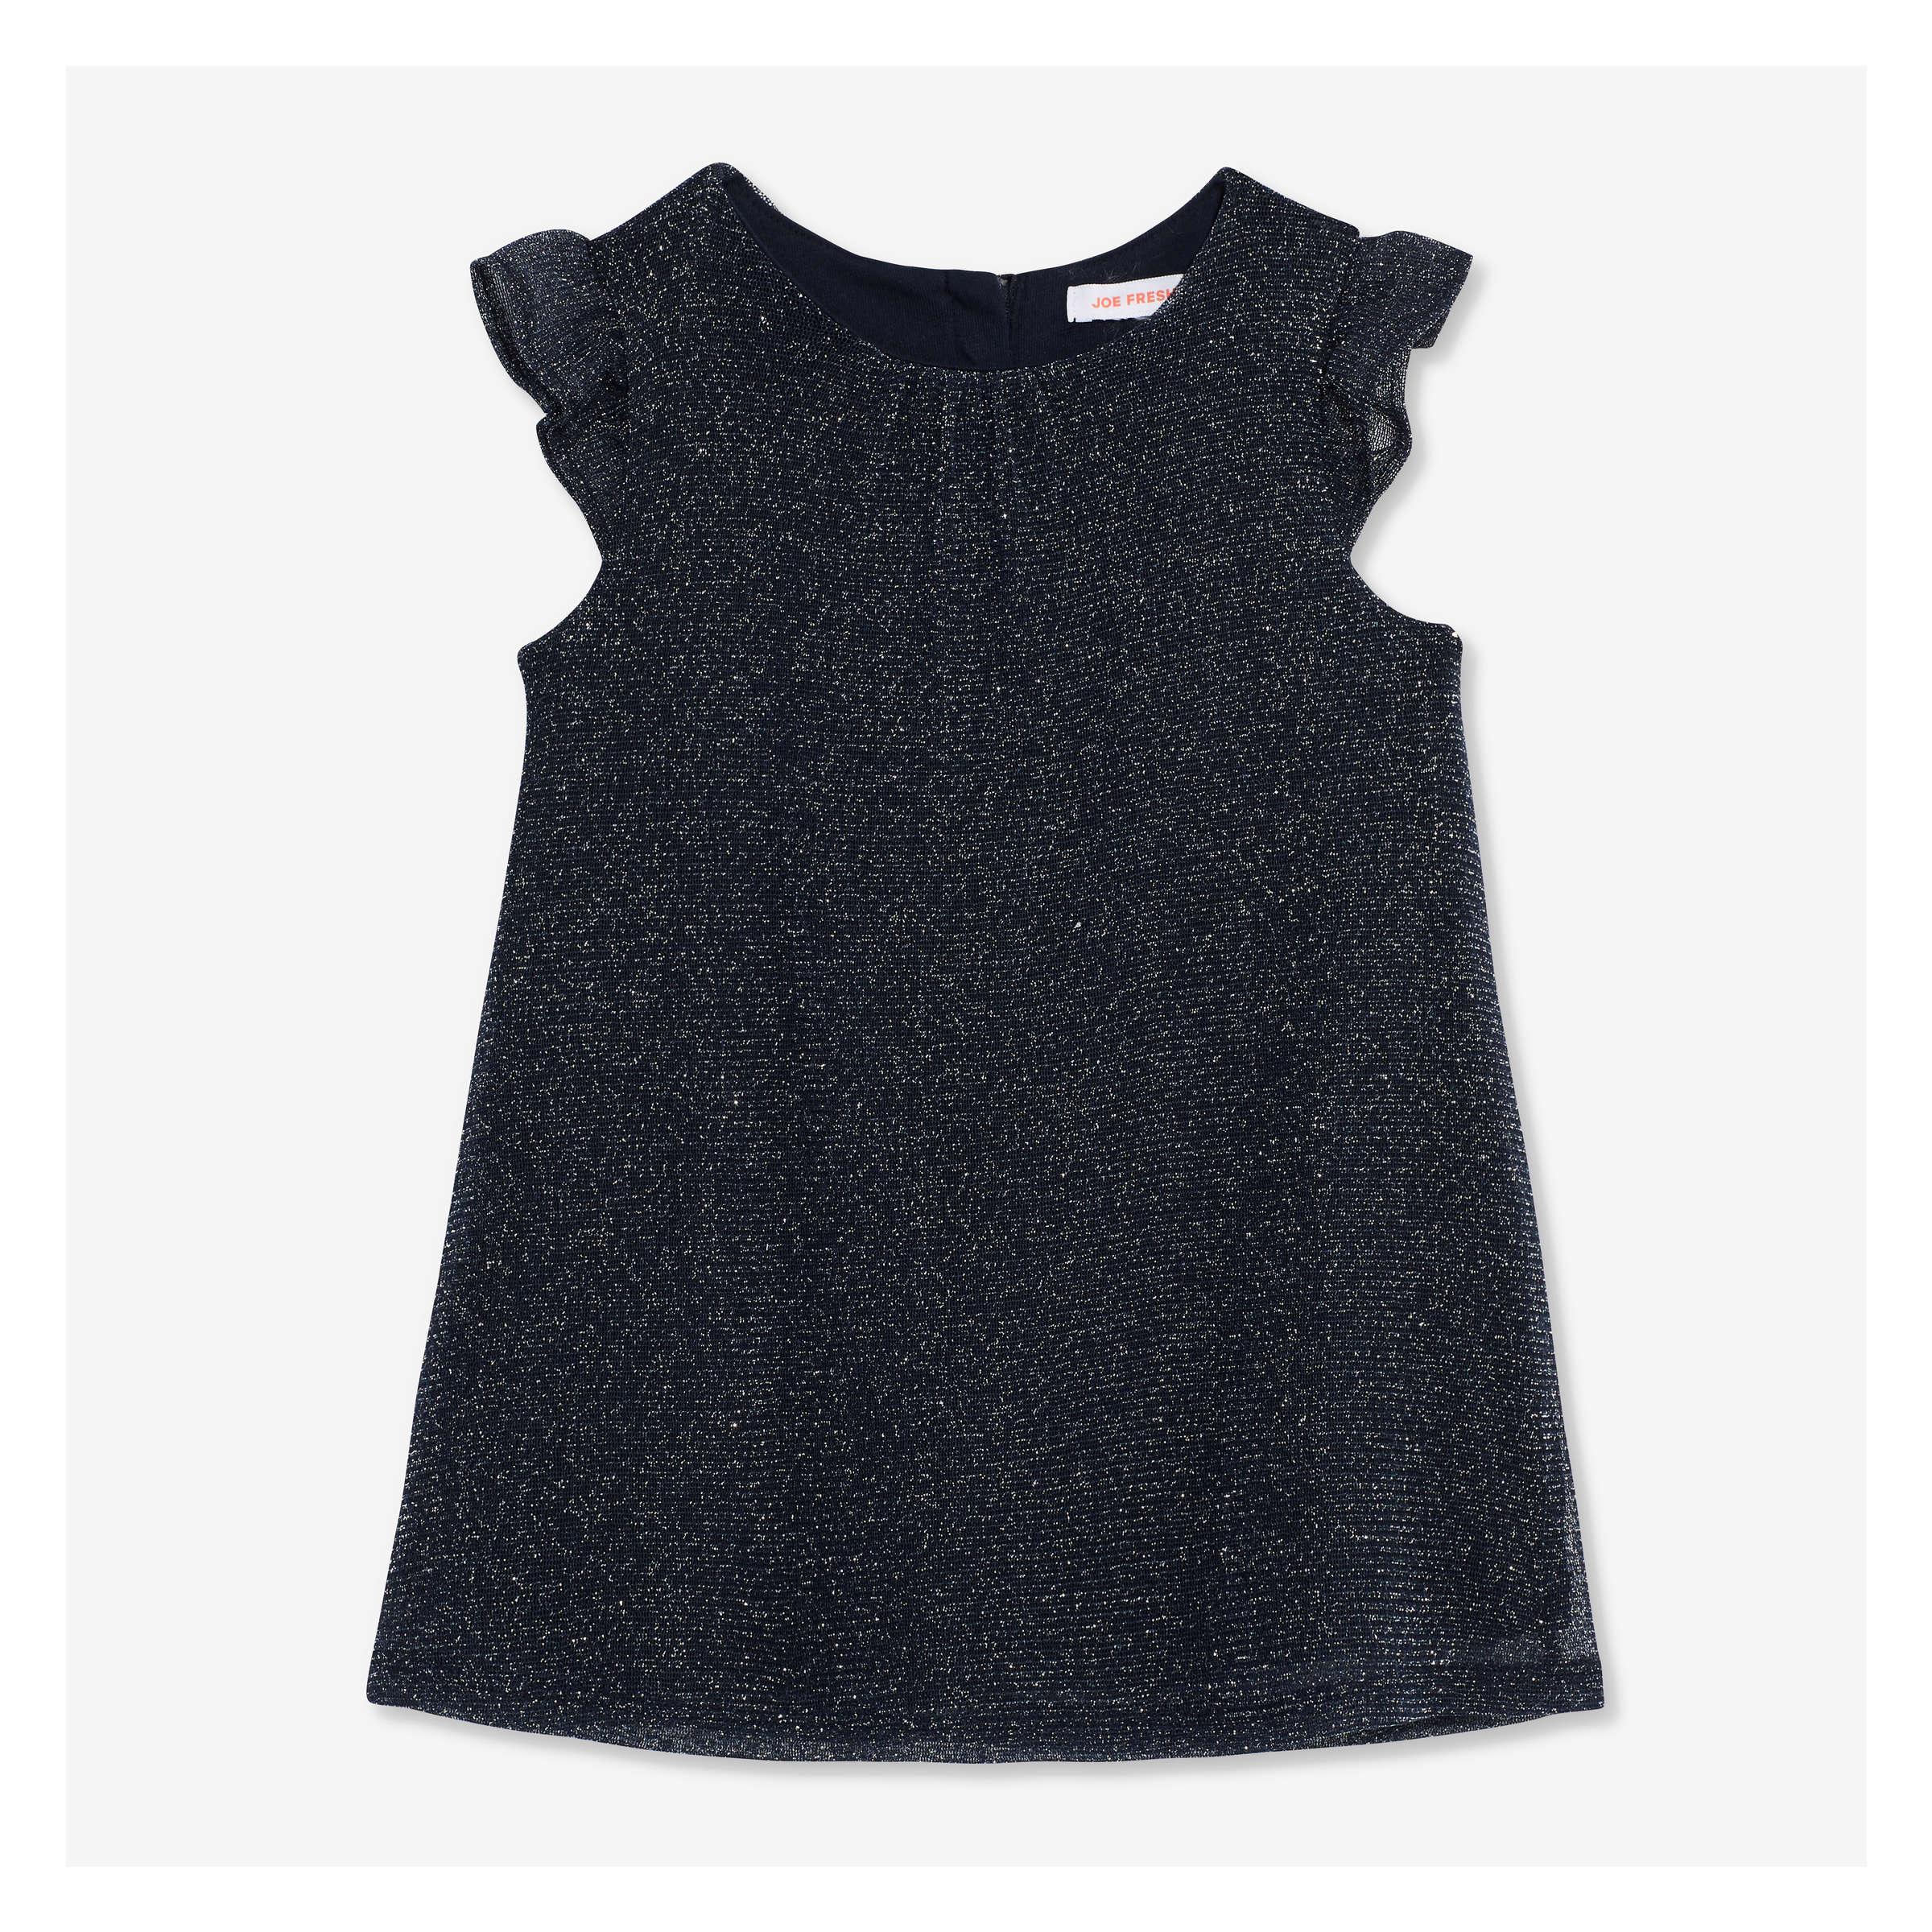 d429b5a82 Baby Girls  Sparkle Dress in JF Midnight Blue from Joe Fresh